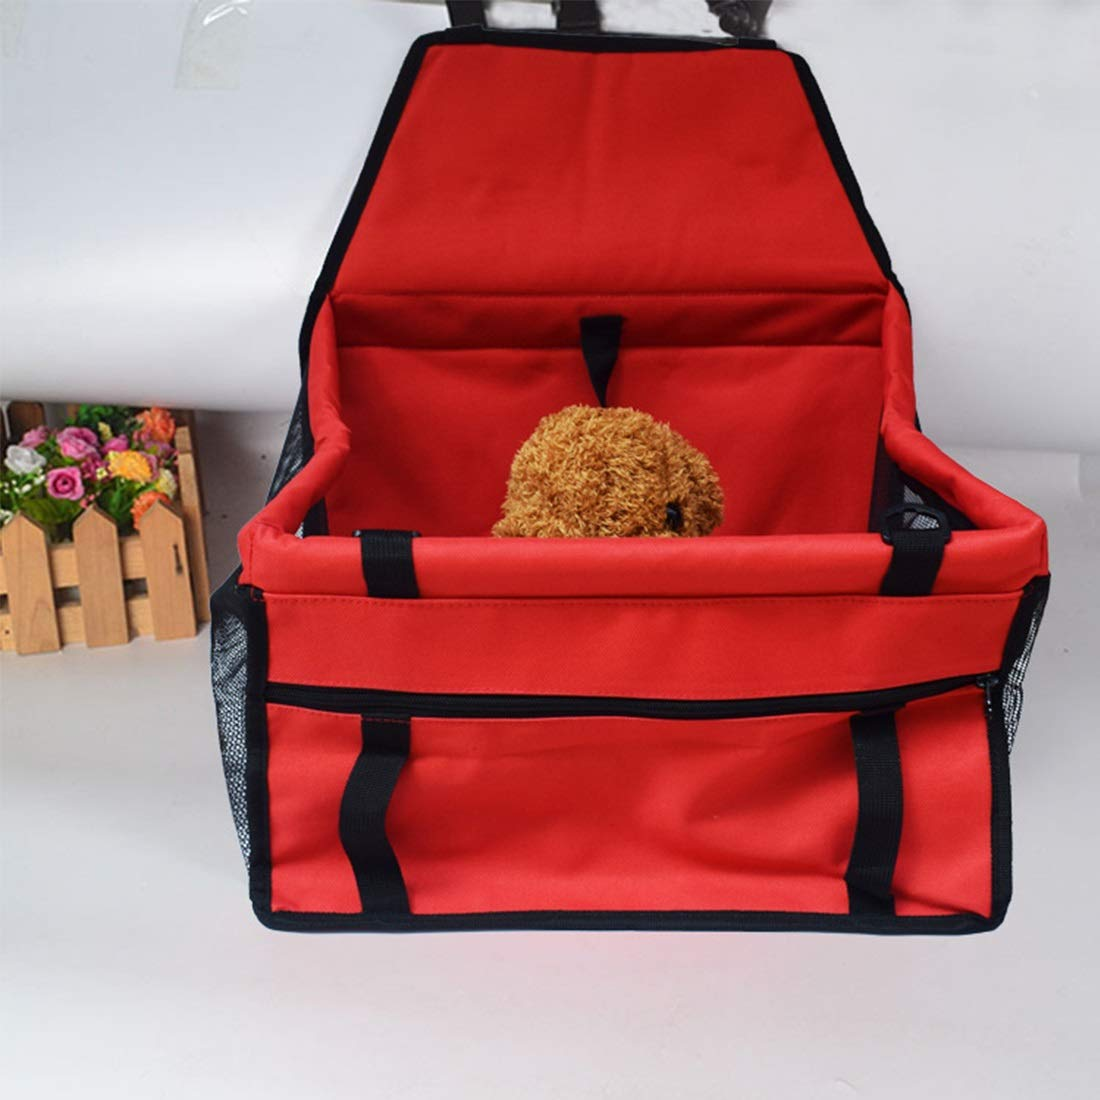 Red 40X30X25CM Red 40X30X25CM YY4 Pet Car Mat Mesh Hanging Bag Breathable Waterproof Double Layer Pet Car Bag Travel Car Mat (color   Red, Size   40X30X25CM)